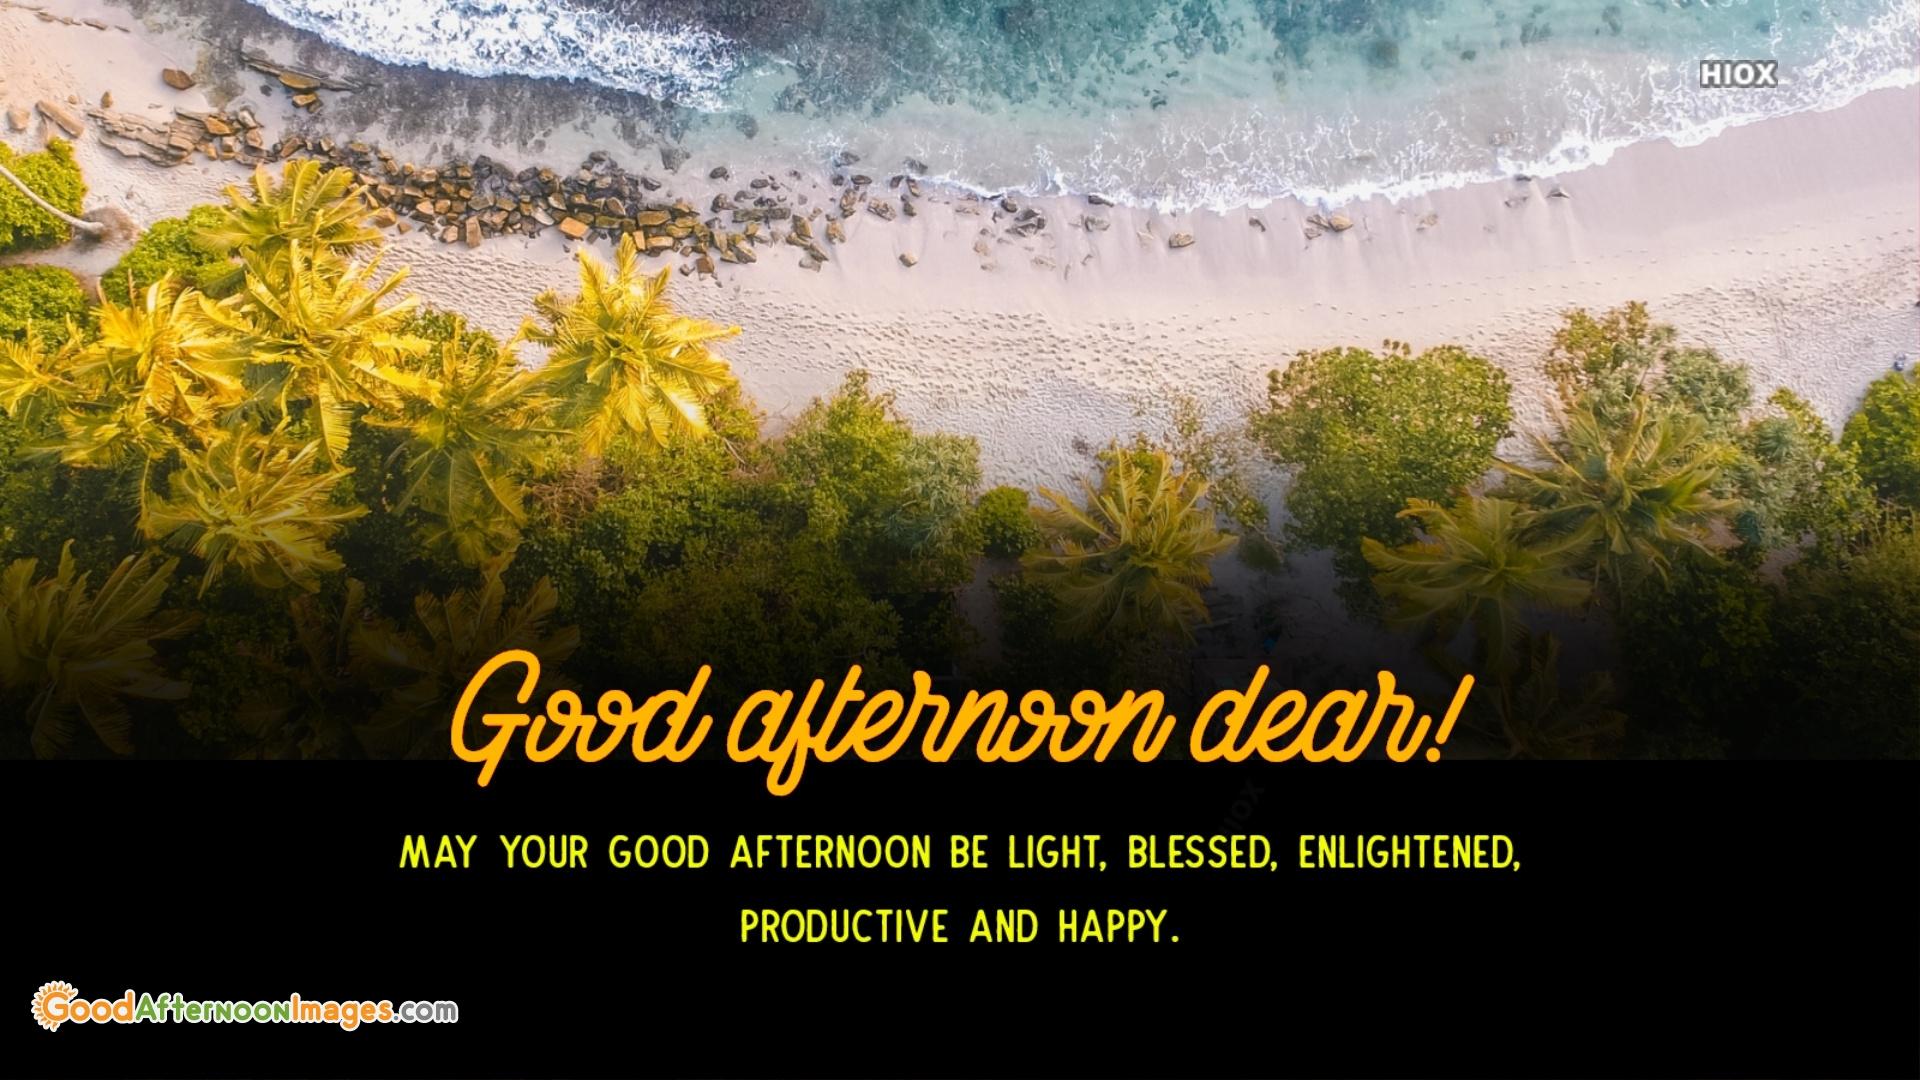 Good Afternoon Dear!